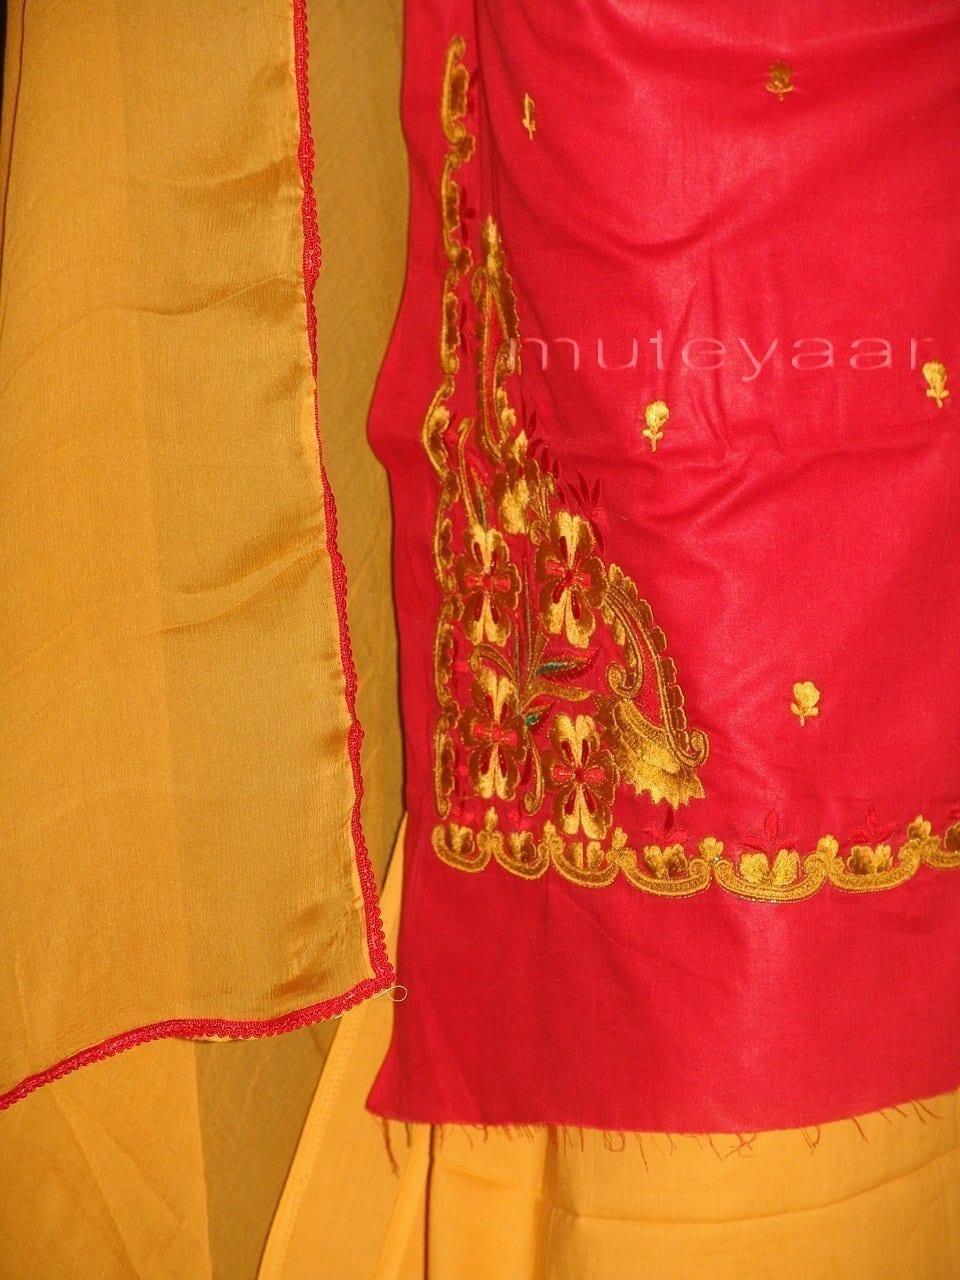 FULL PATIALA 100% cotton Salwar Suit PURE CHIFFON Dupatta RM235 3